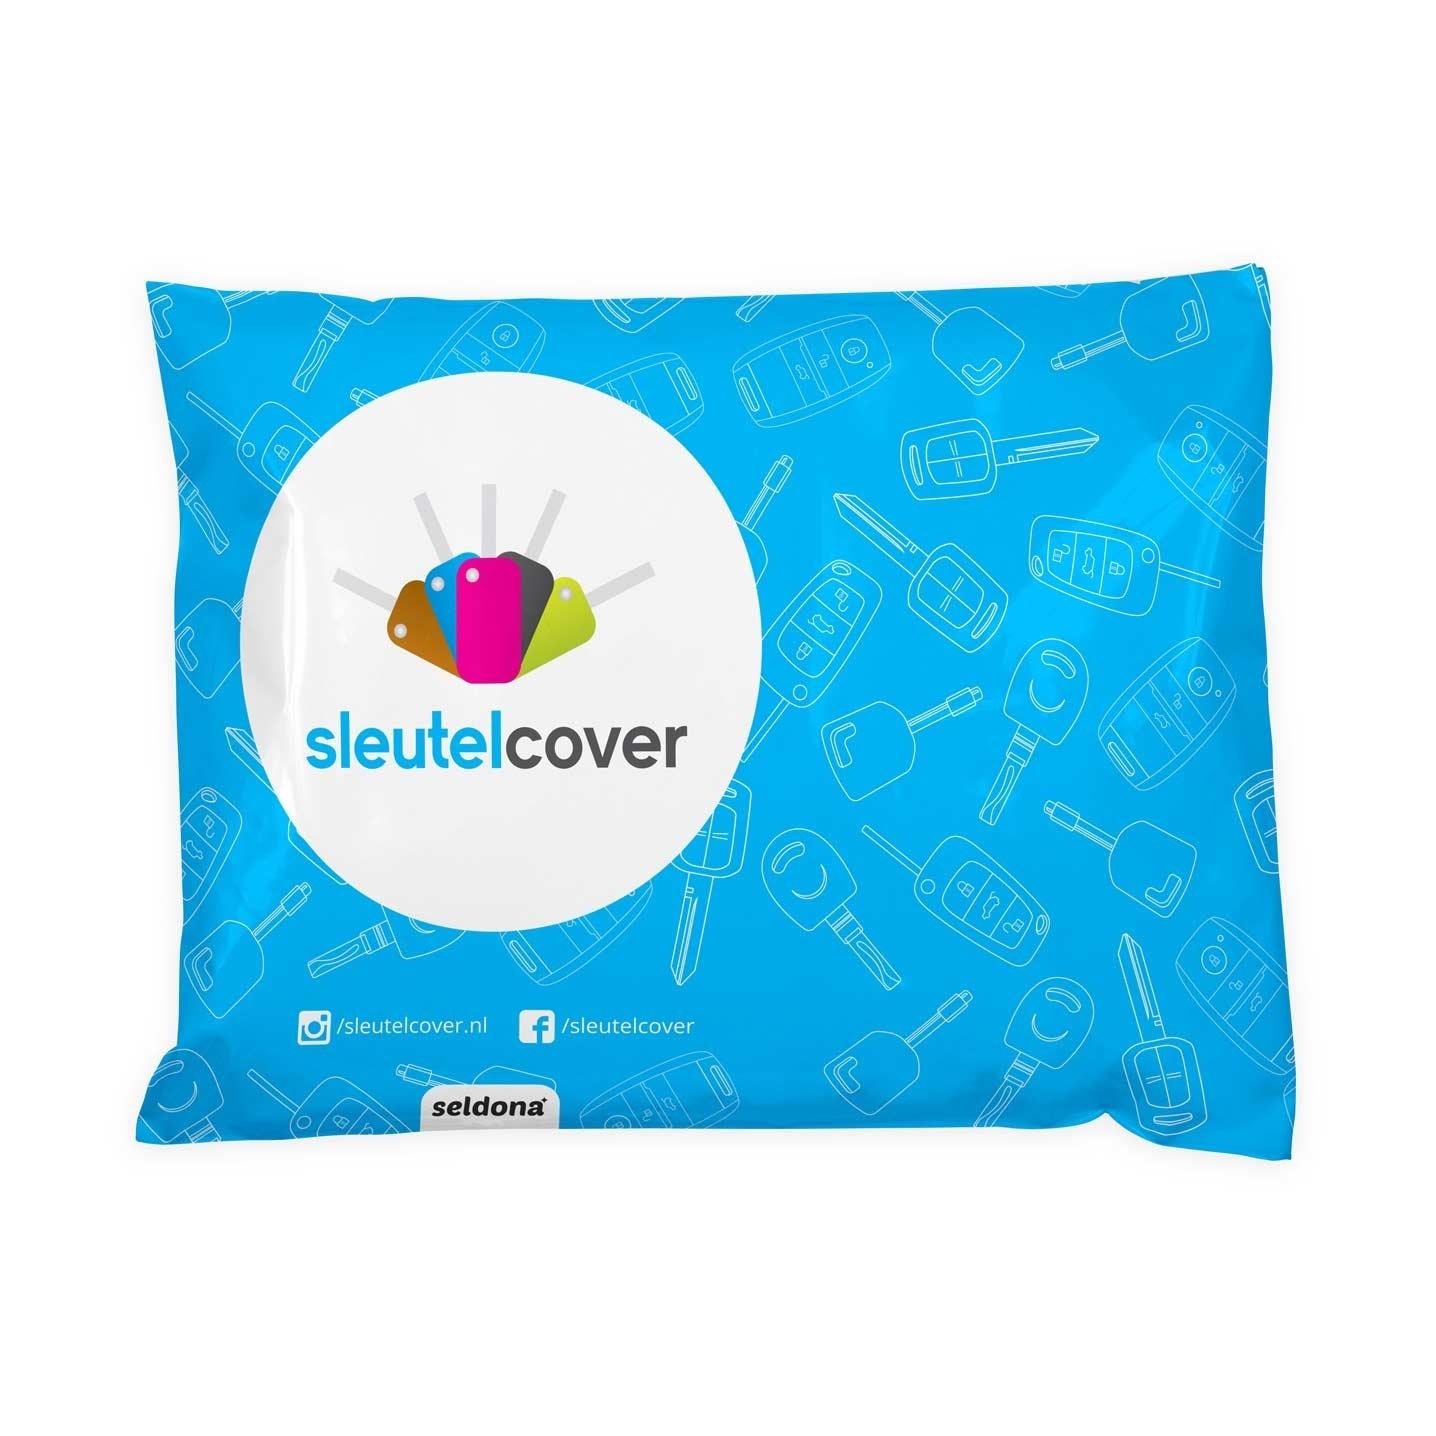 Skoda SleutelCover - Lichtblauw / Silicone sleutelhoesje / beschermhoesje autosleutel